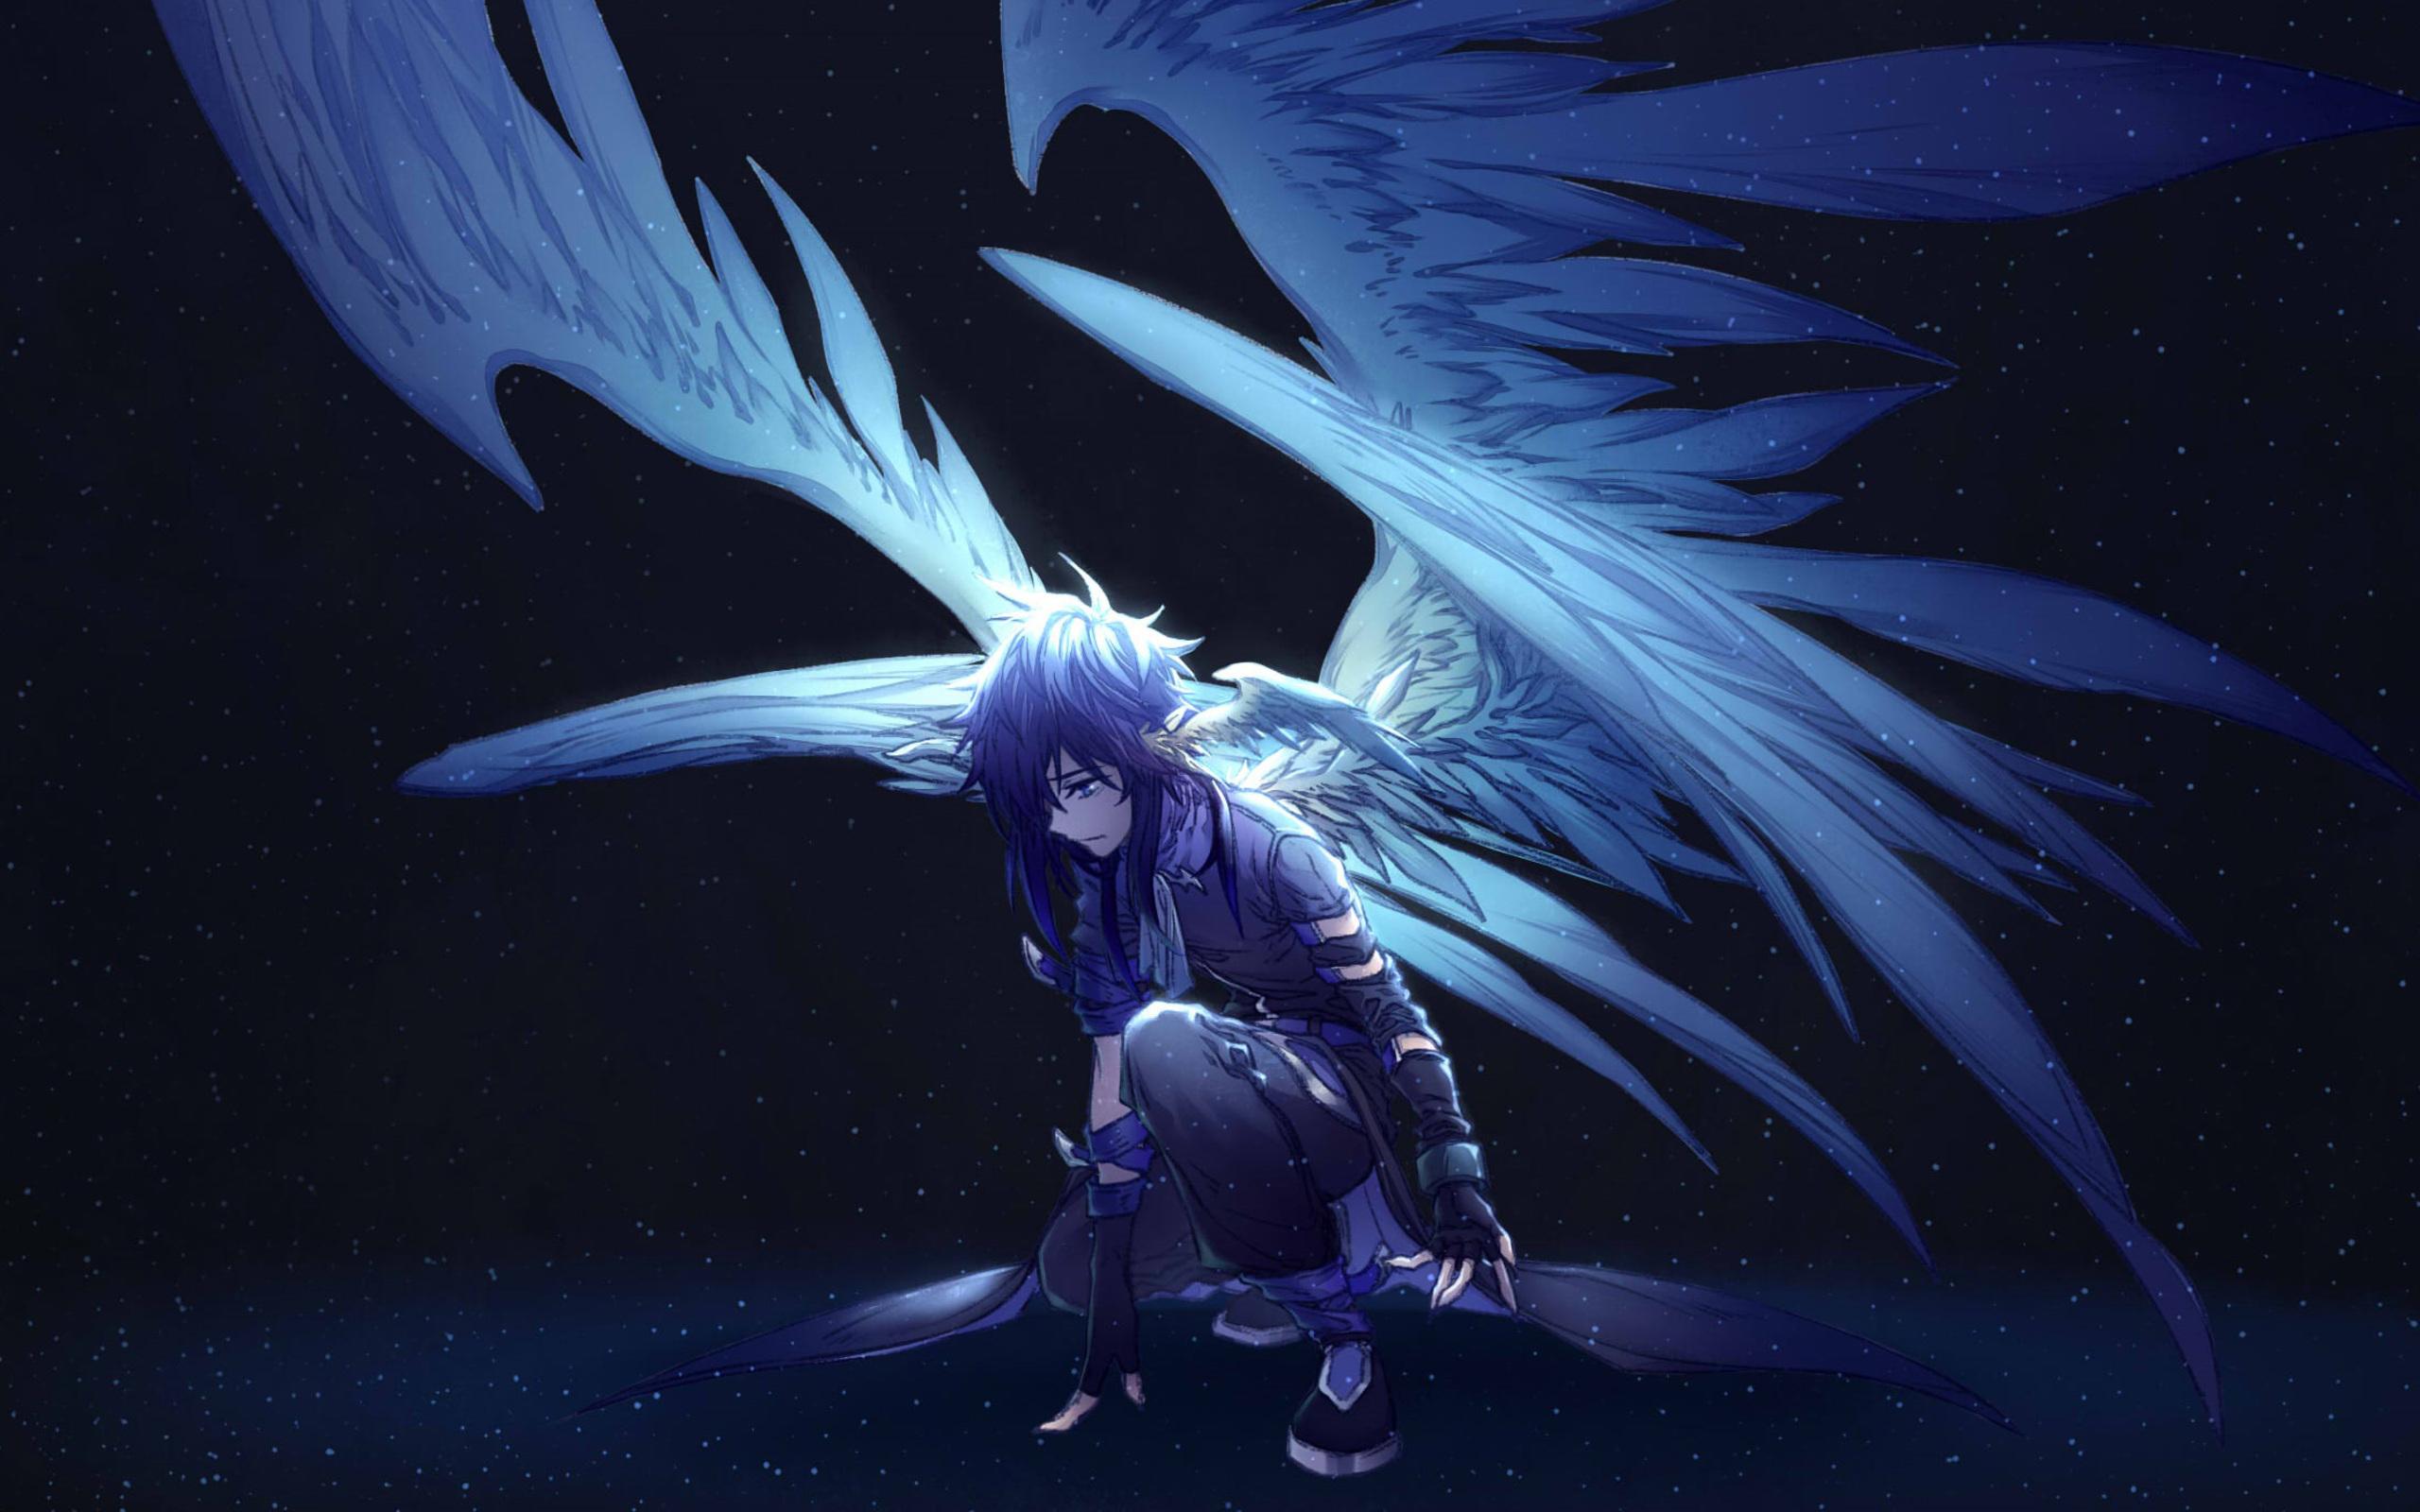 angel-anime-jn.jpg